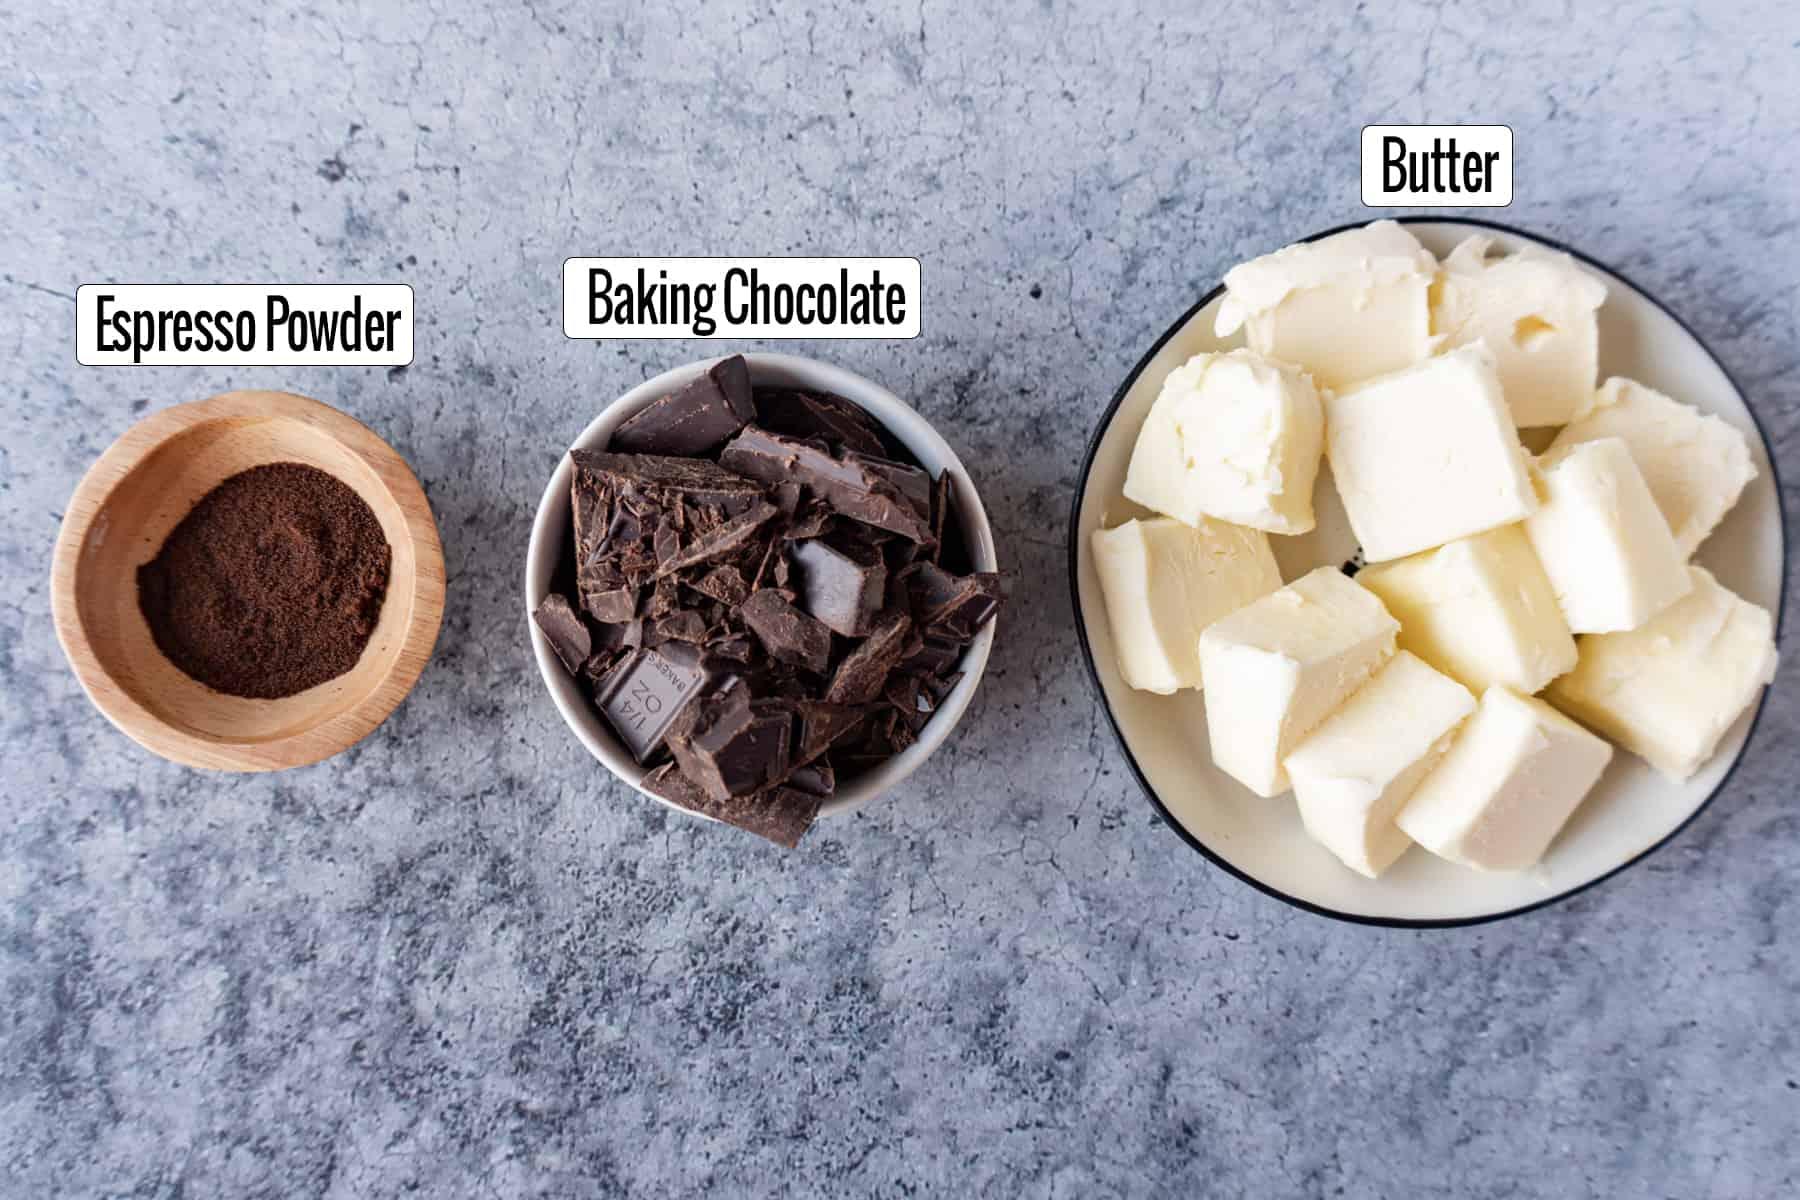 Best Homemade Brownies Recipe Ingredients : espresso powder, baking chocolate, butter